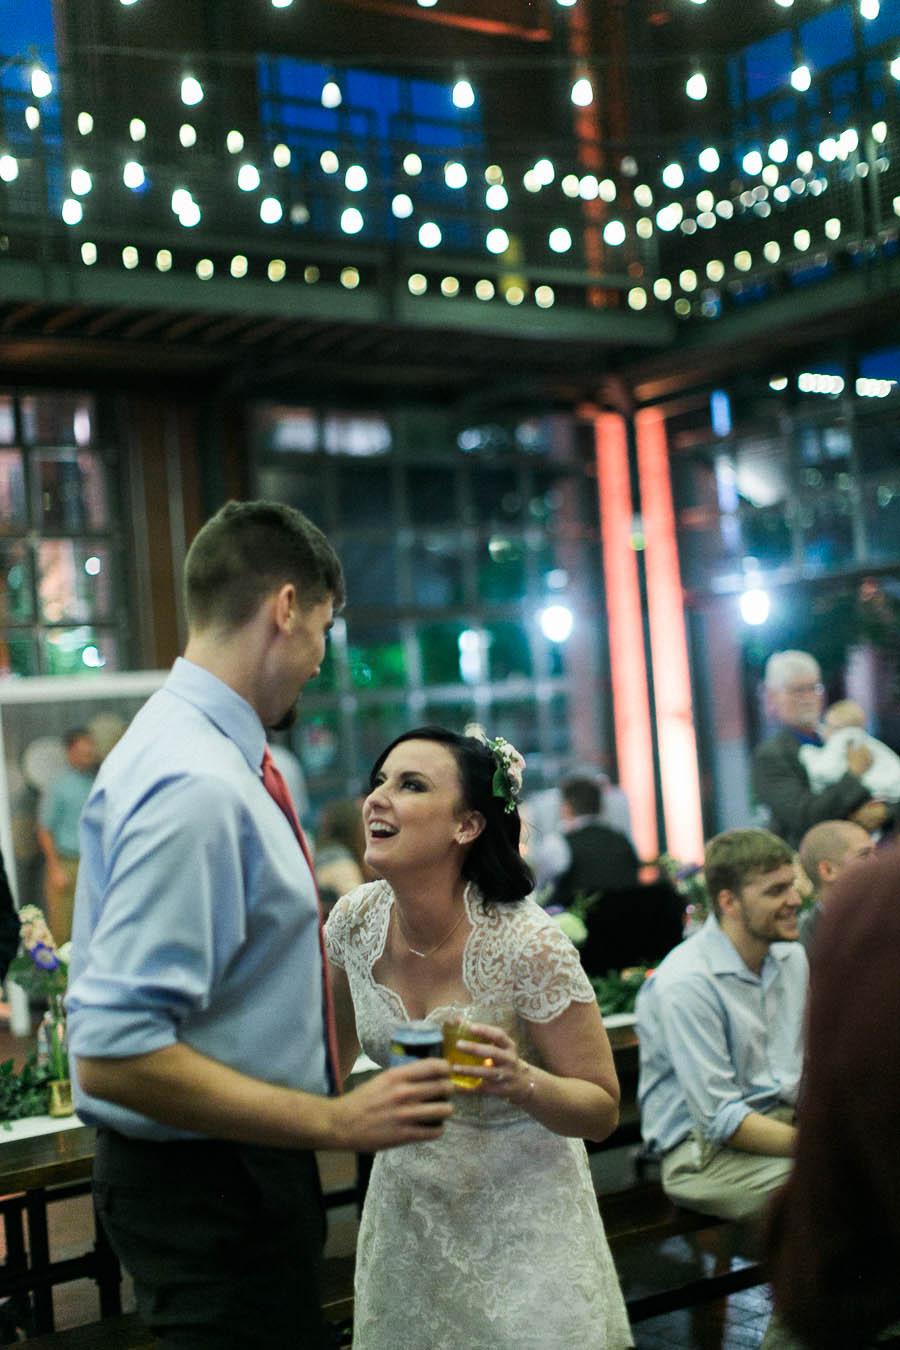 chattanooga film wedding photographer documentary natural gentle real life ©2016abigailbobophotography-74.jpg